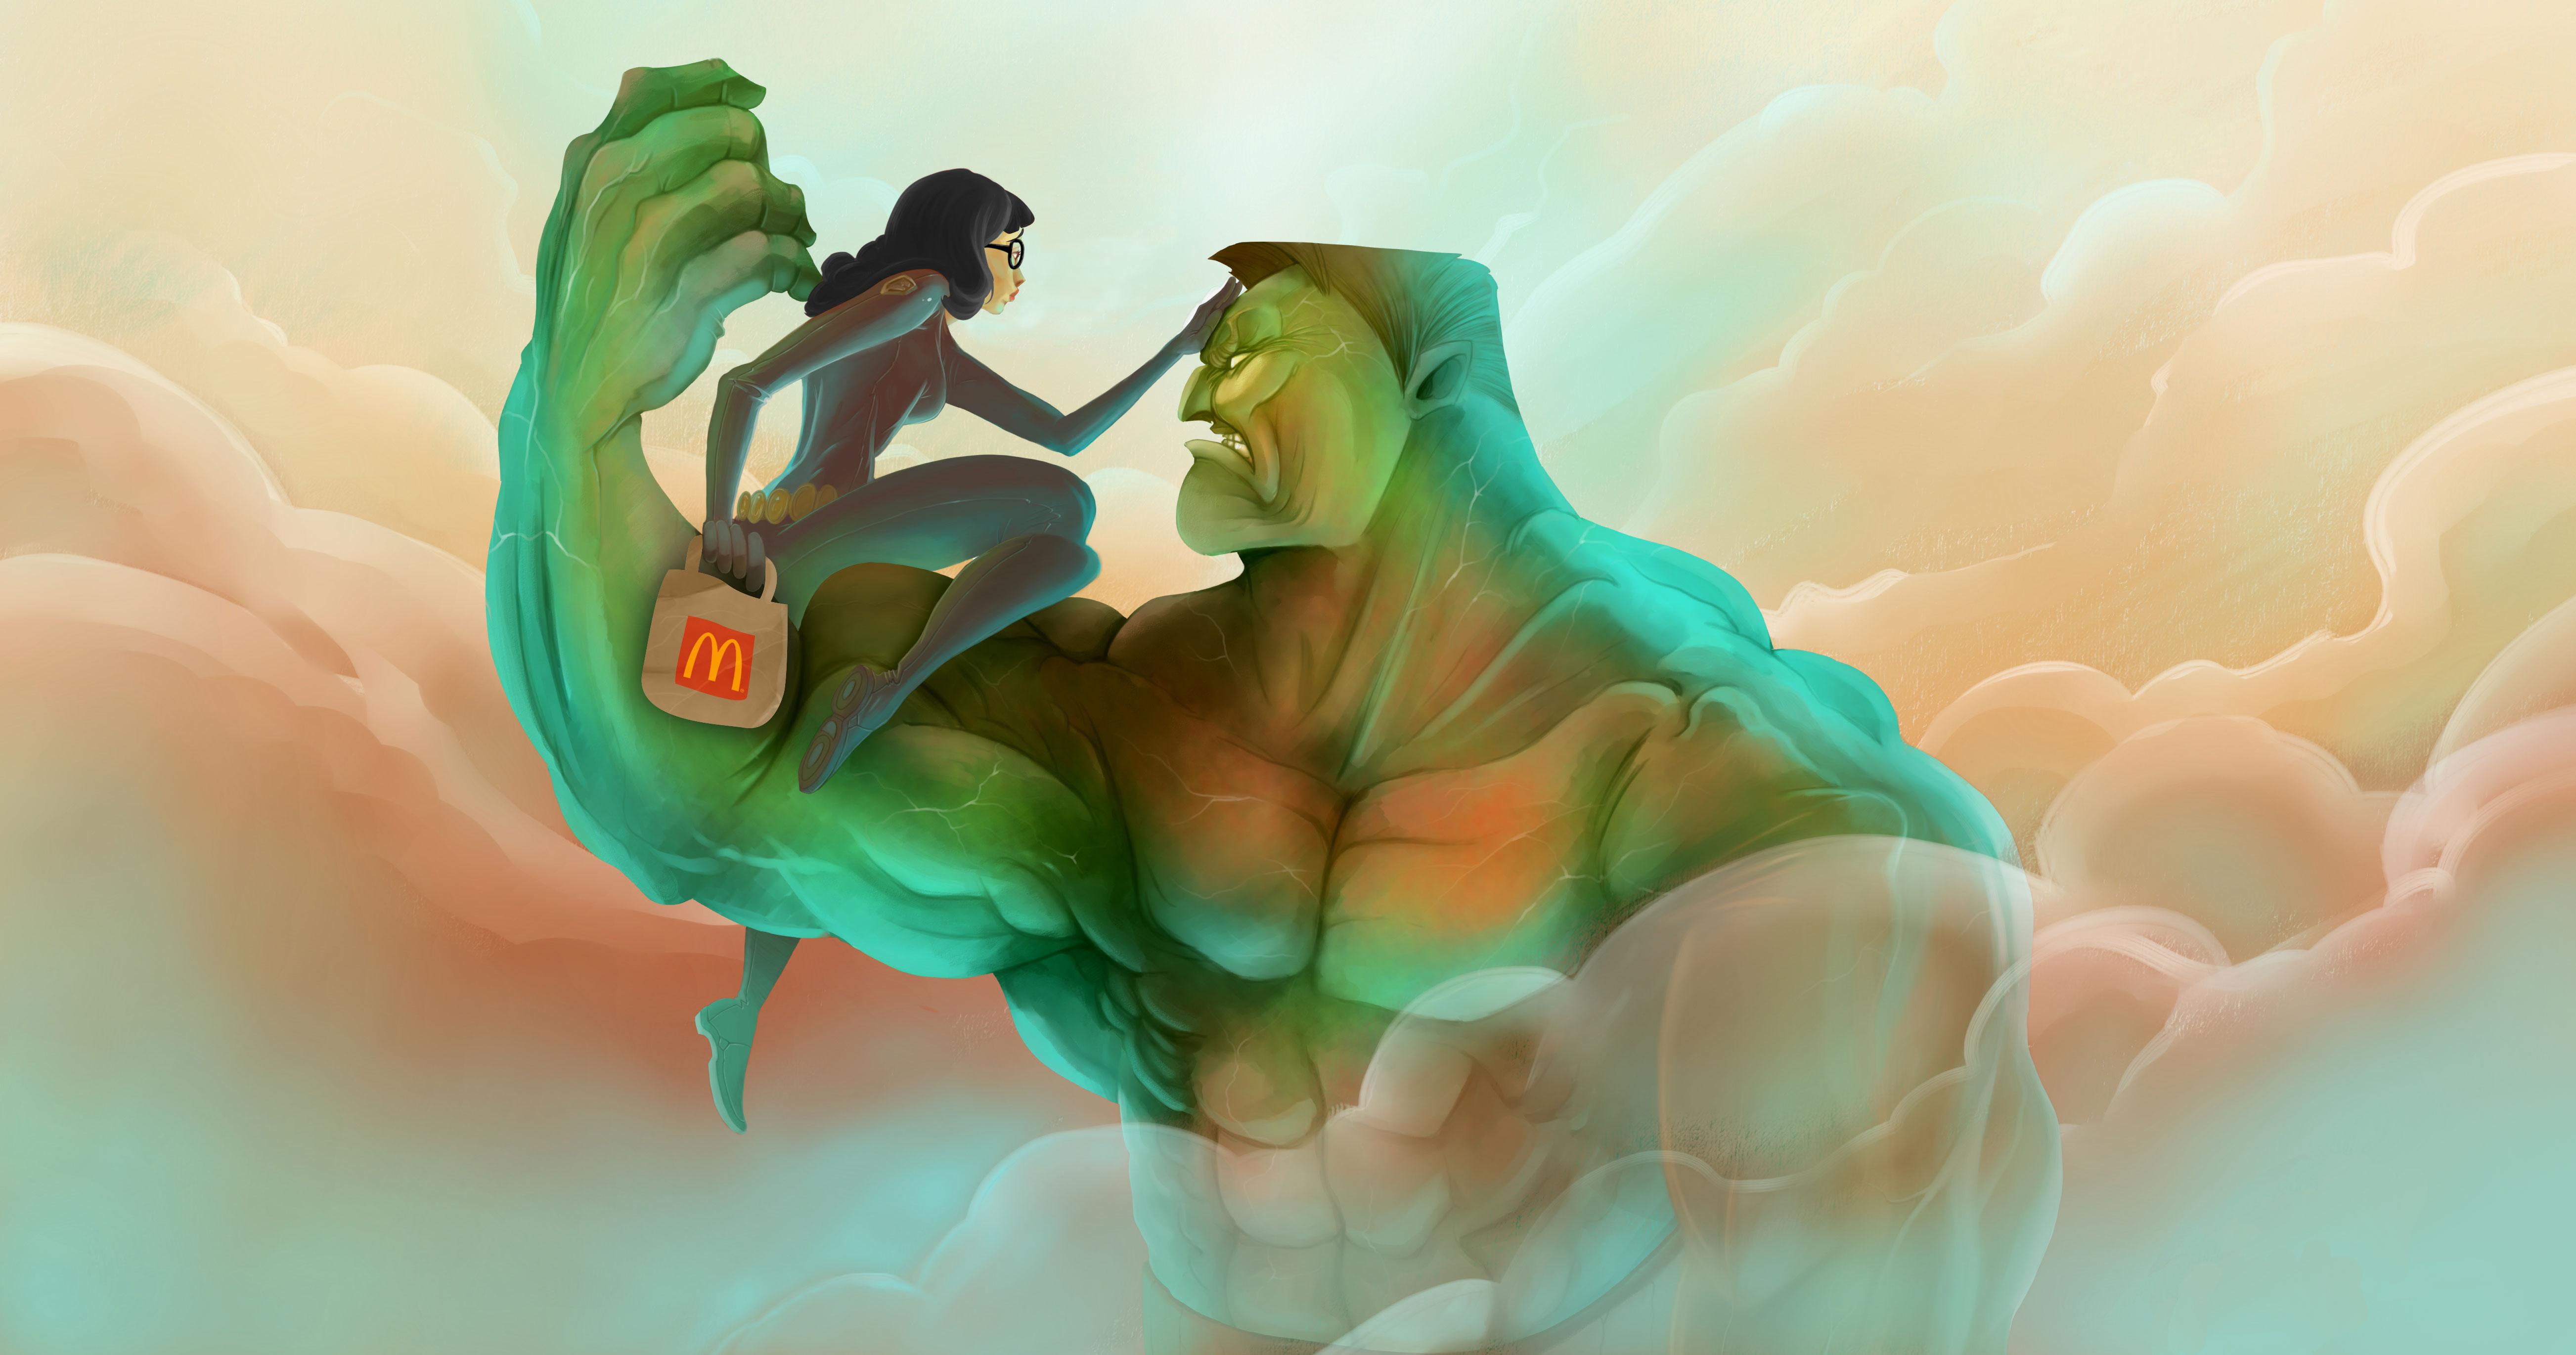 Hulk McDonald's